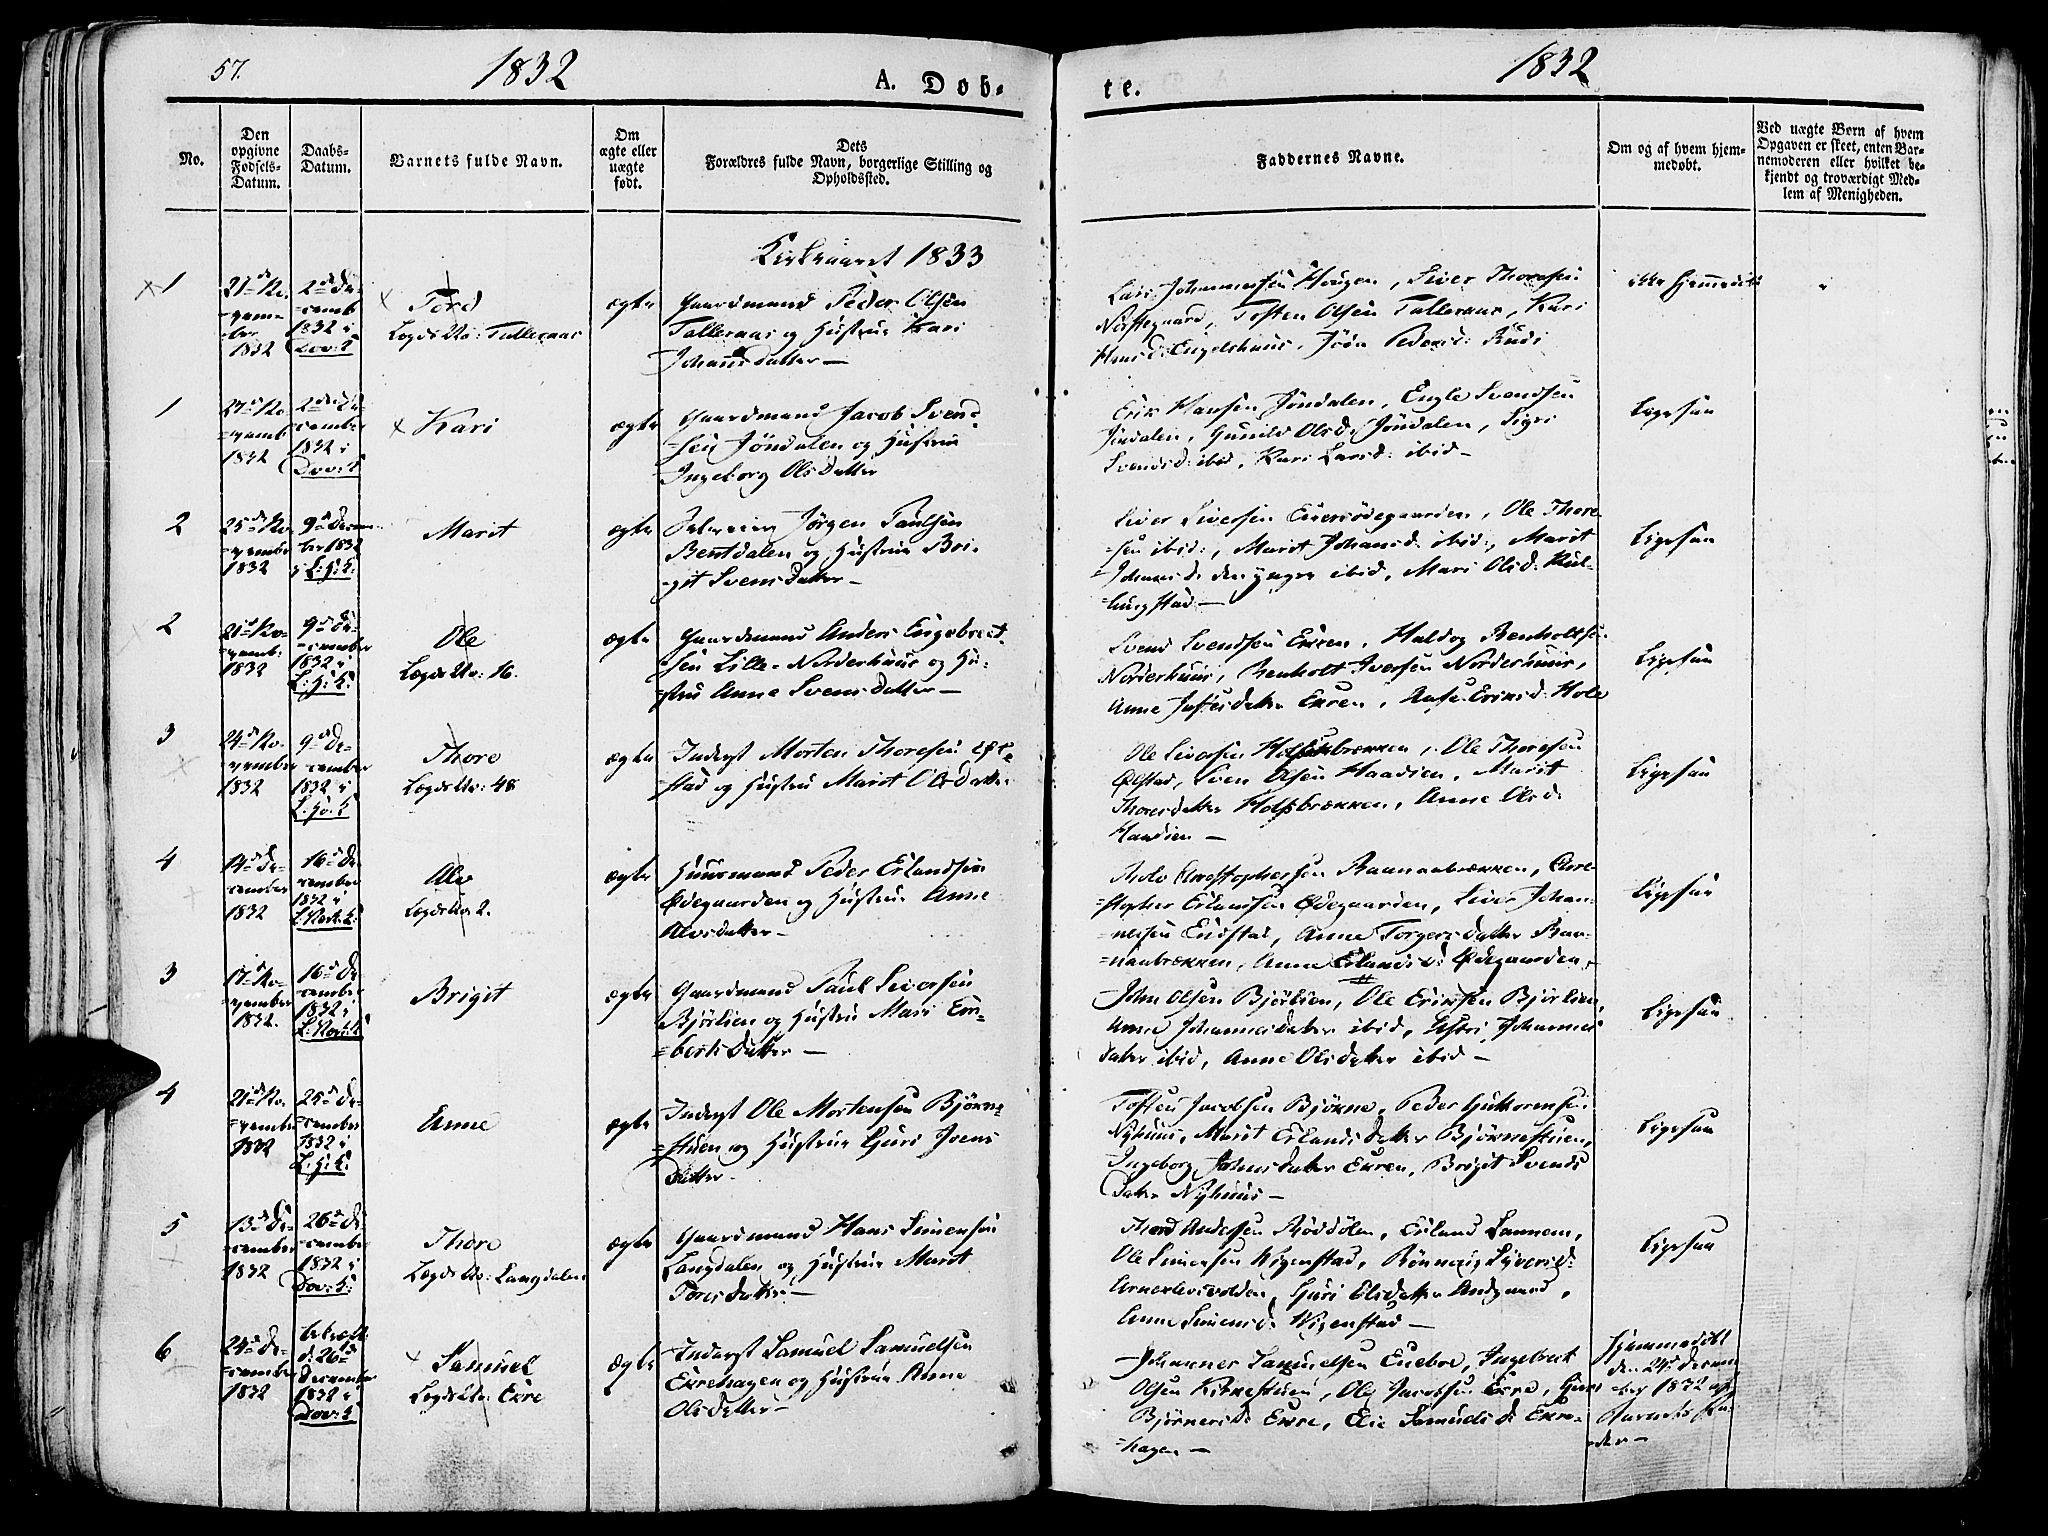 SAH, Lesja prestekontor, Ministerialbok nr. 5, 1830-1842, s. 57